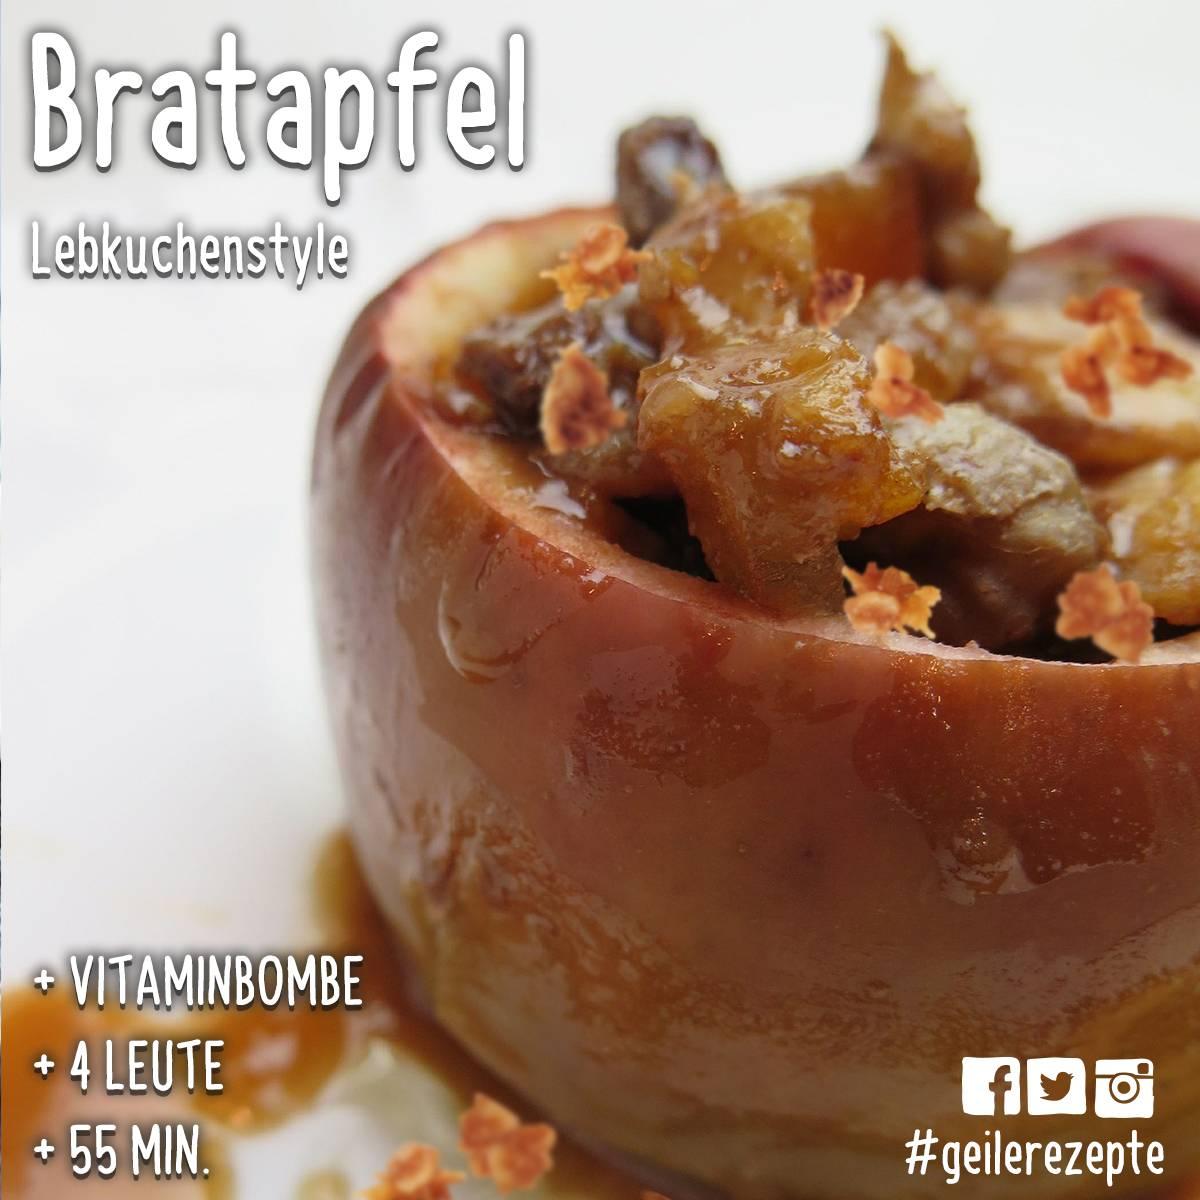 #geilerezepte: Bratapfel